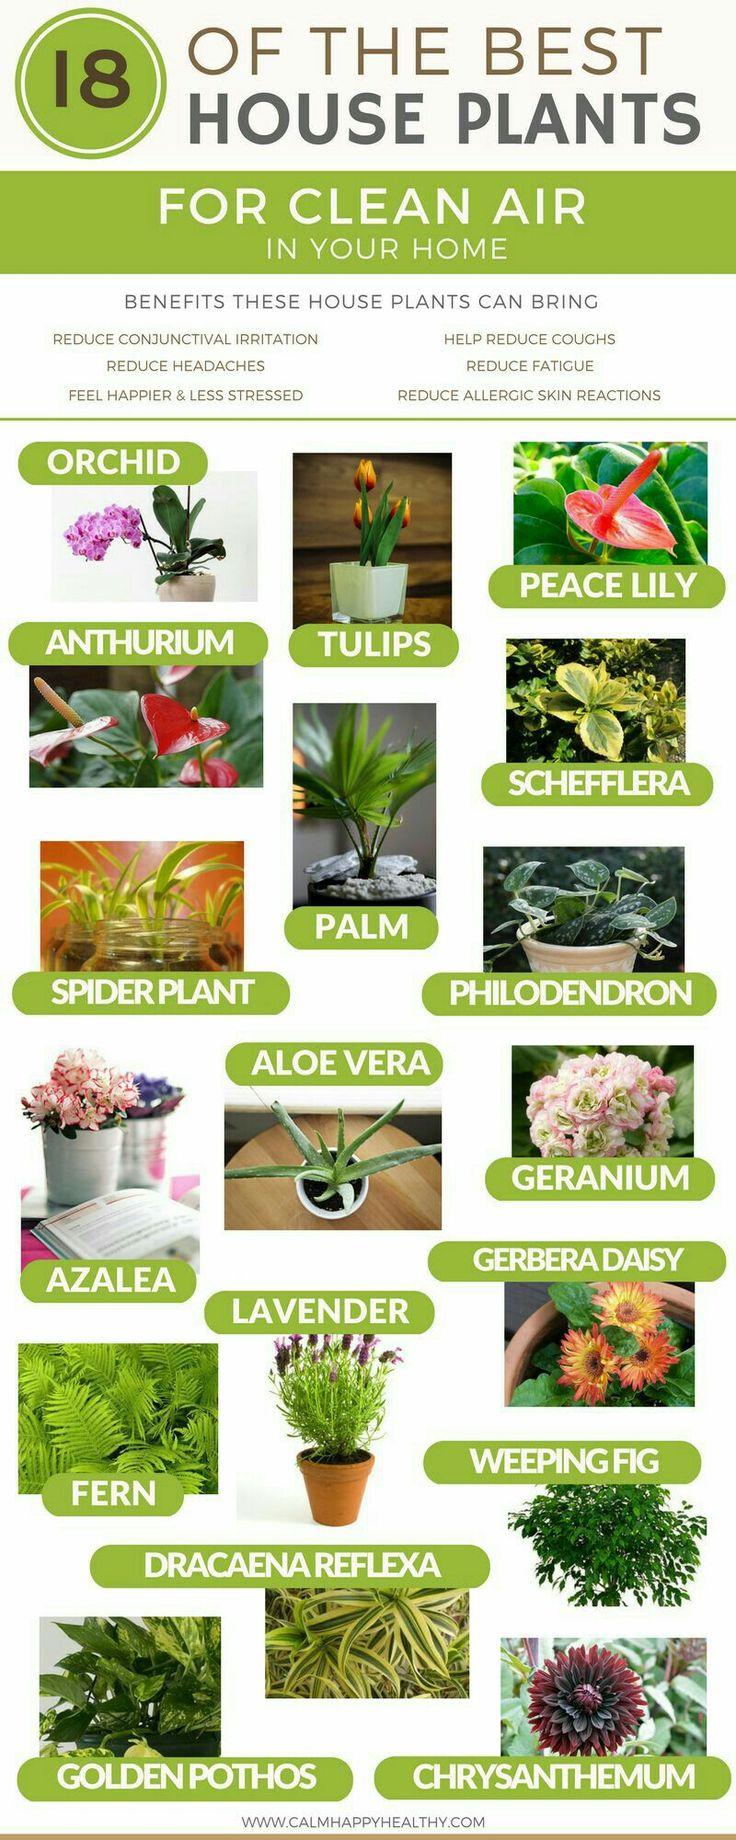 425 Best Gardening Images On Pinterest Gardening